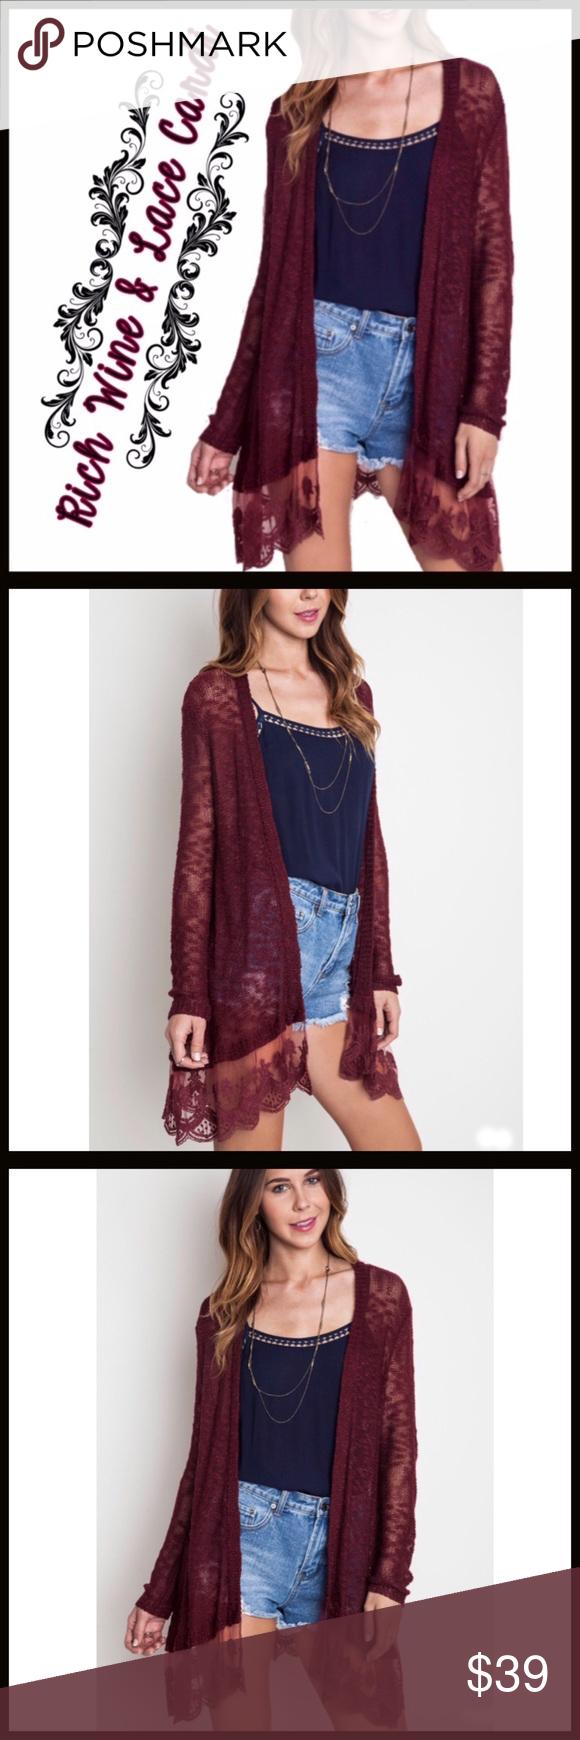 Lightweight Sweater Burgundy & Lace Boutique | Lace trim